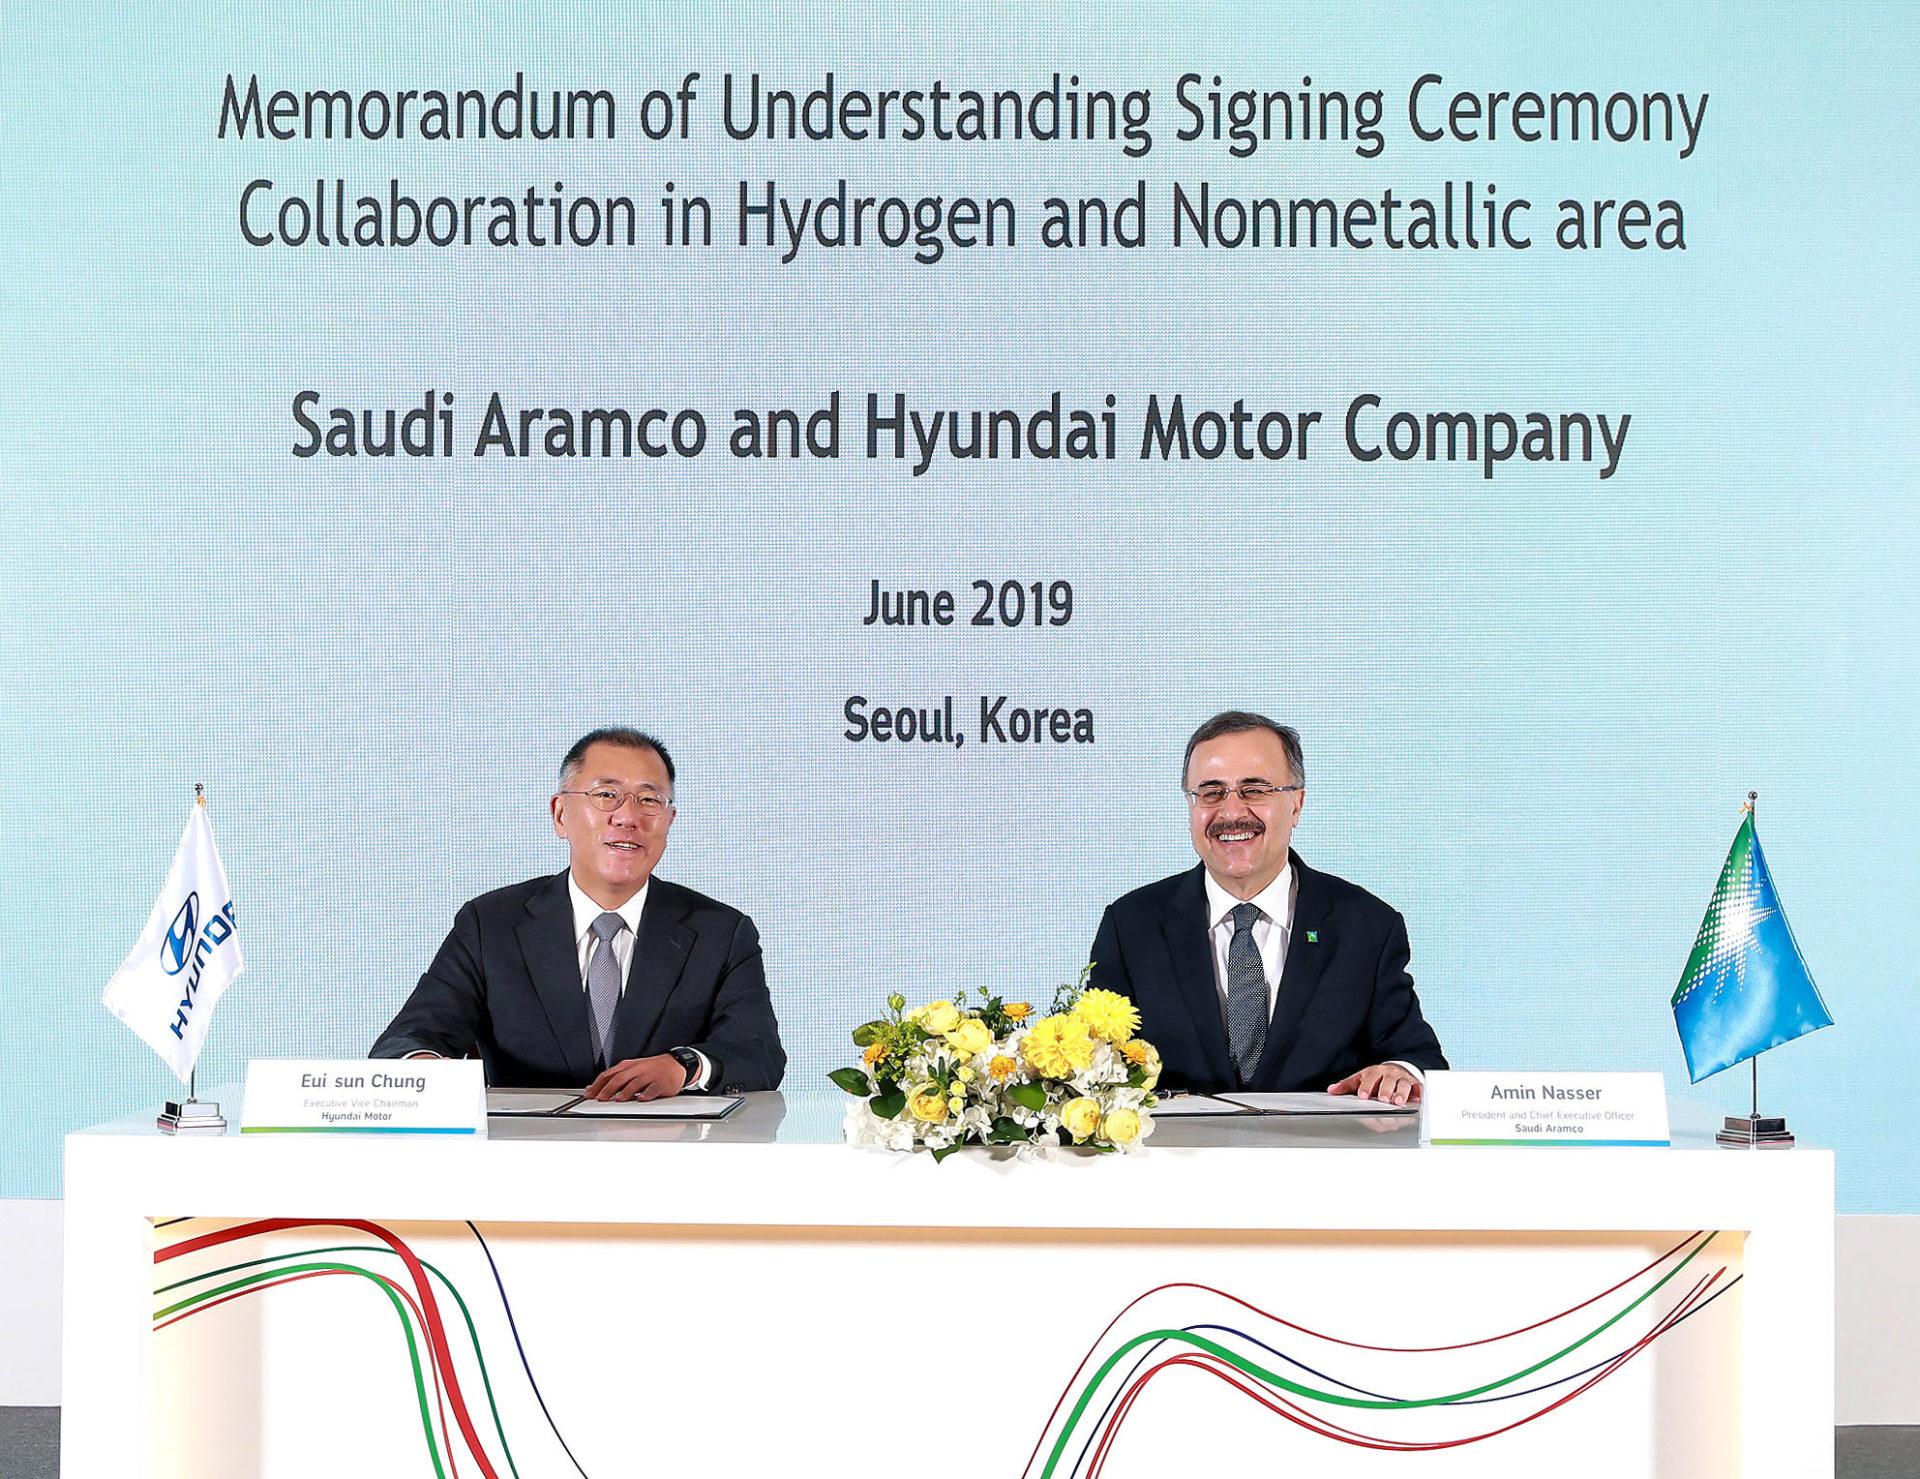 Hyundai e Saudi Aramco acordo